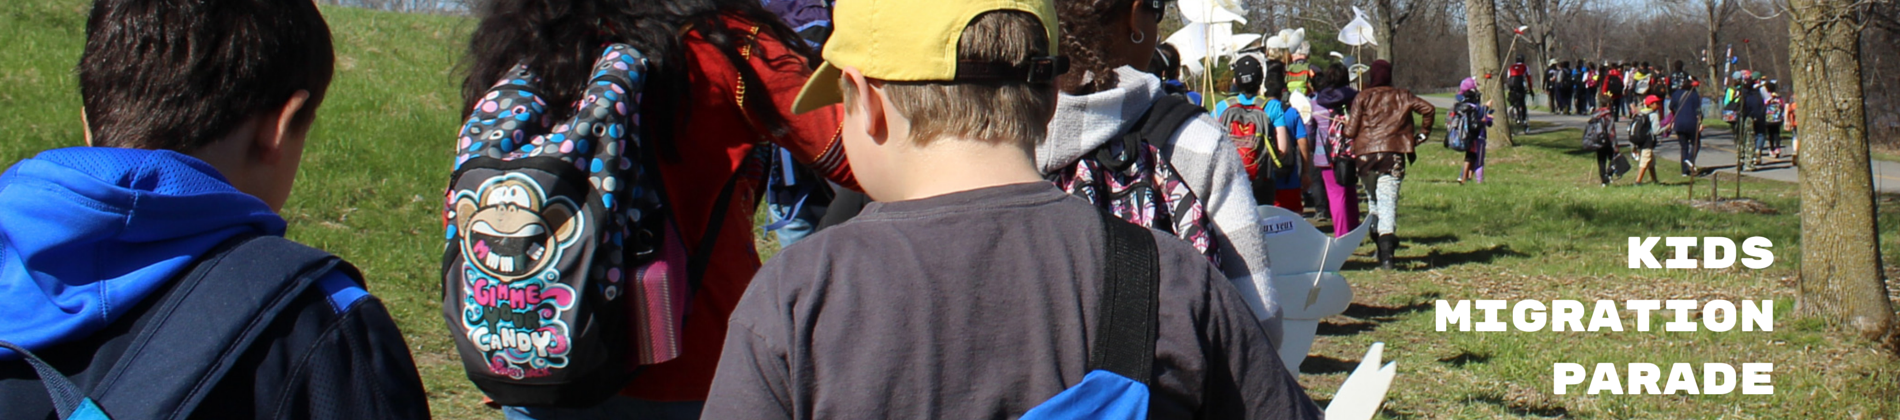 kids in migration parade